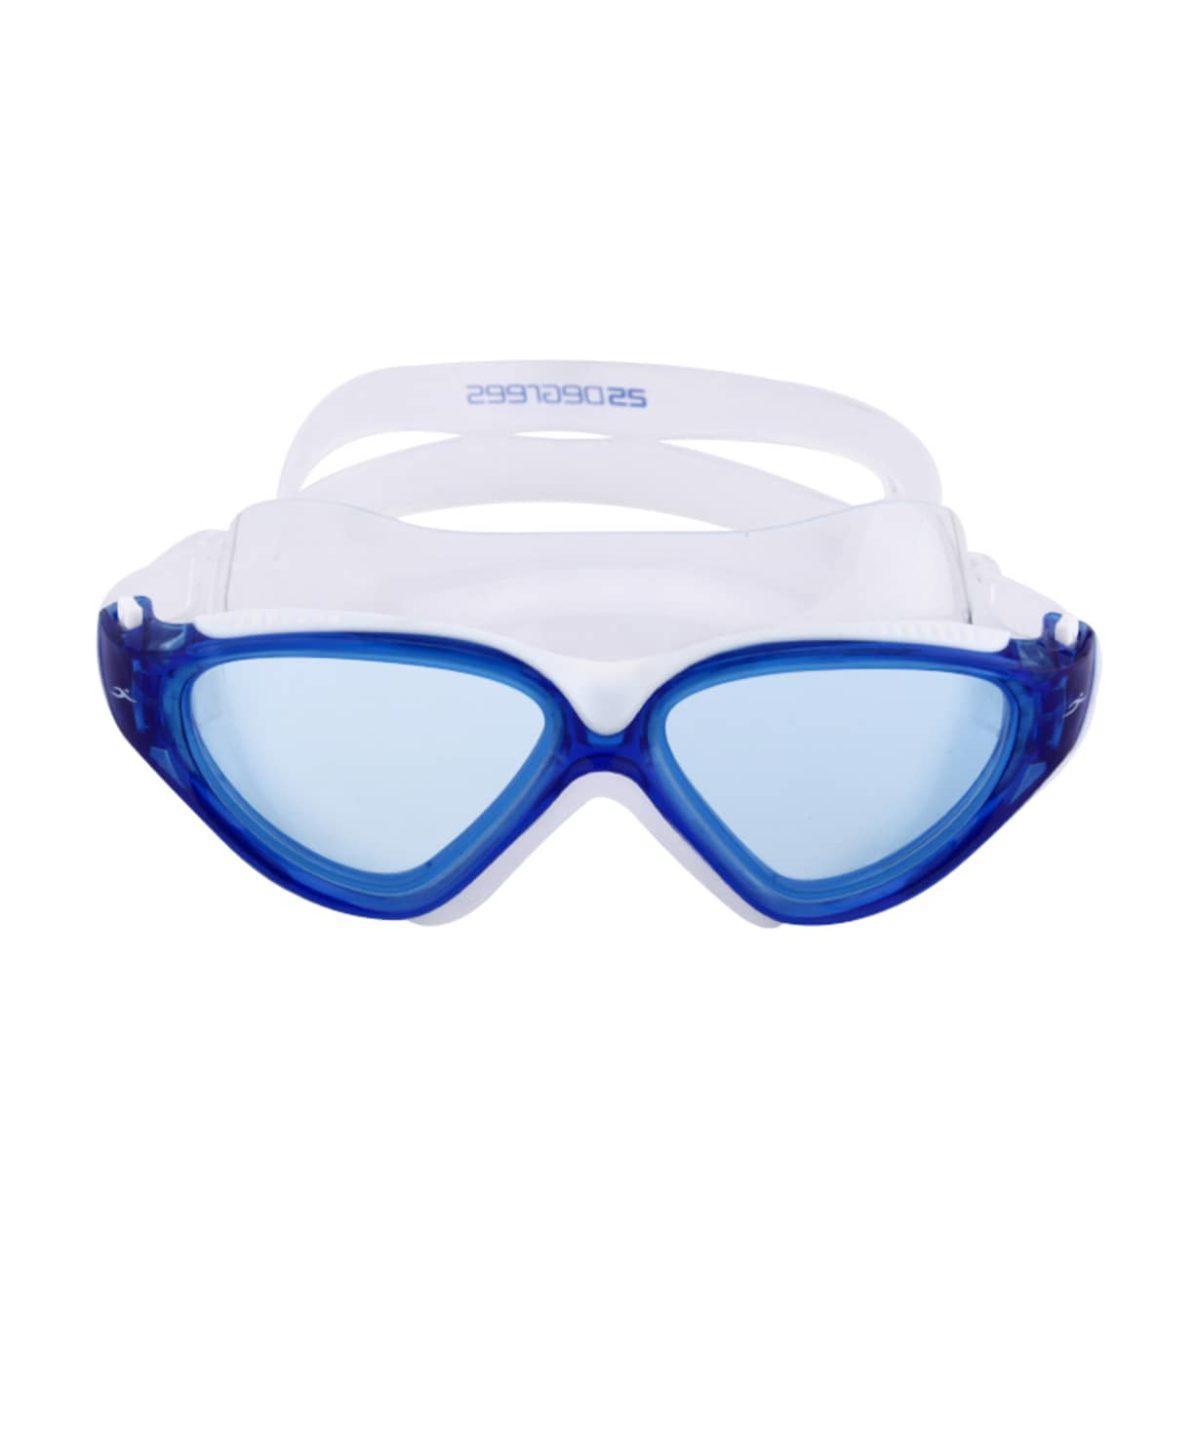 25DEGREES Маска для плавания Yogic Transparent  25D04-YG25-20-30 - 2